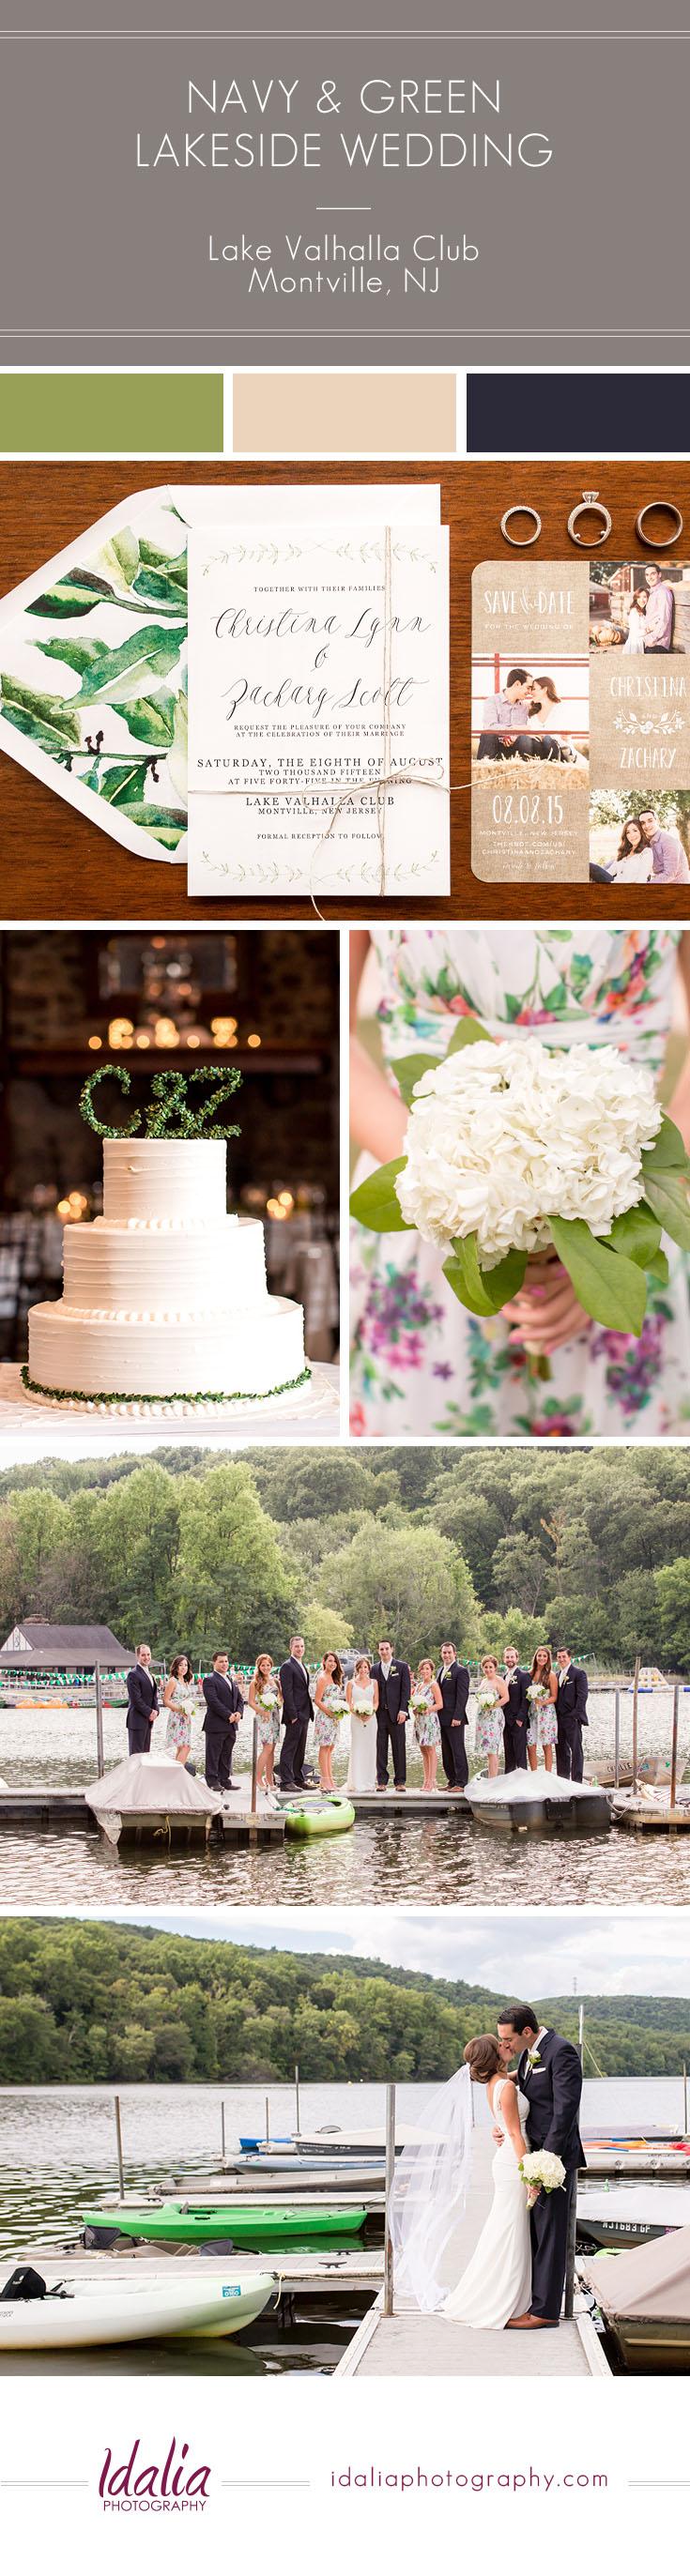 Navy and green lakeside nj wedding lake valhalla club montville